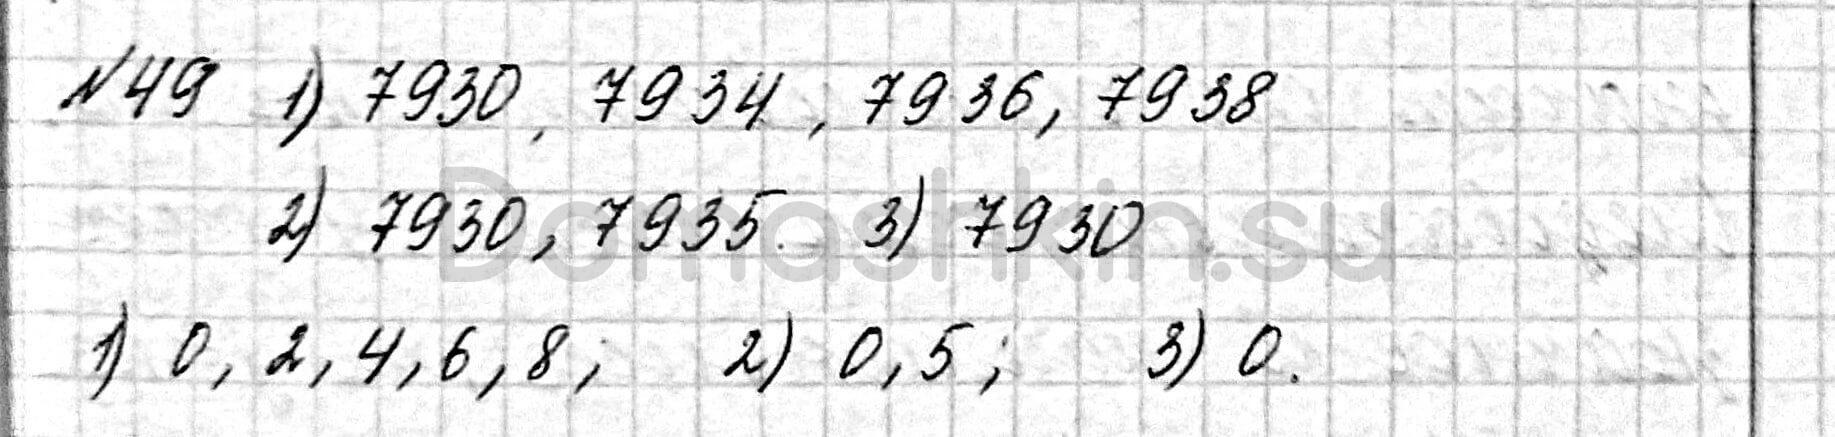 Математика 6 класс учебник Мерзляк номер 49 решение